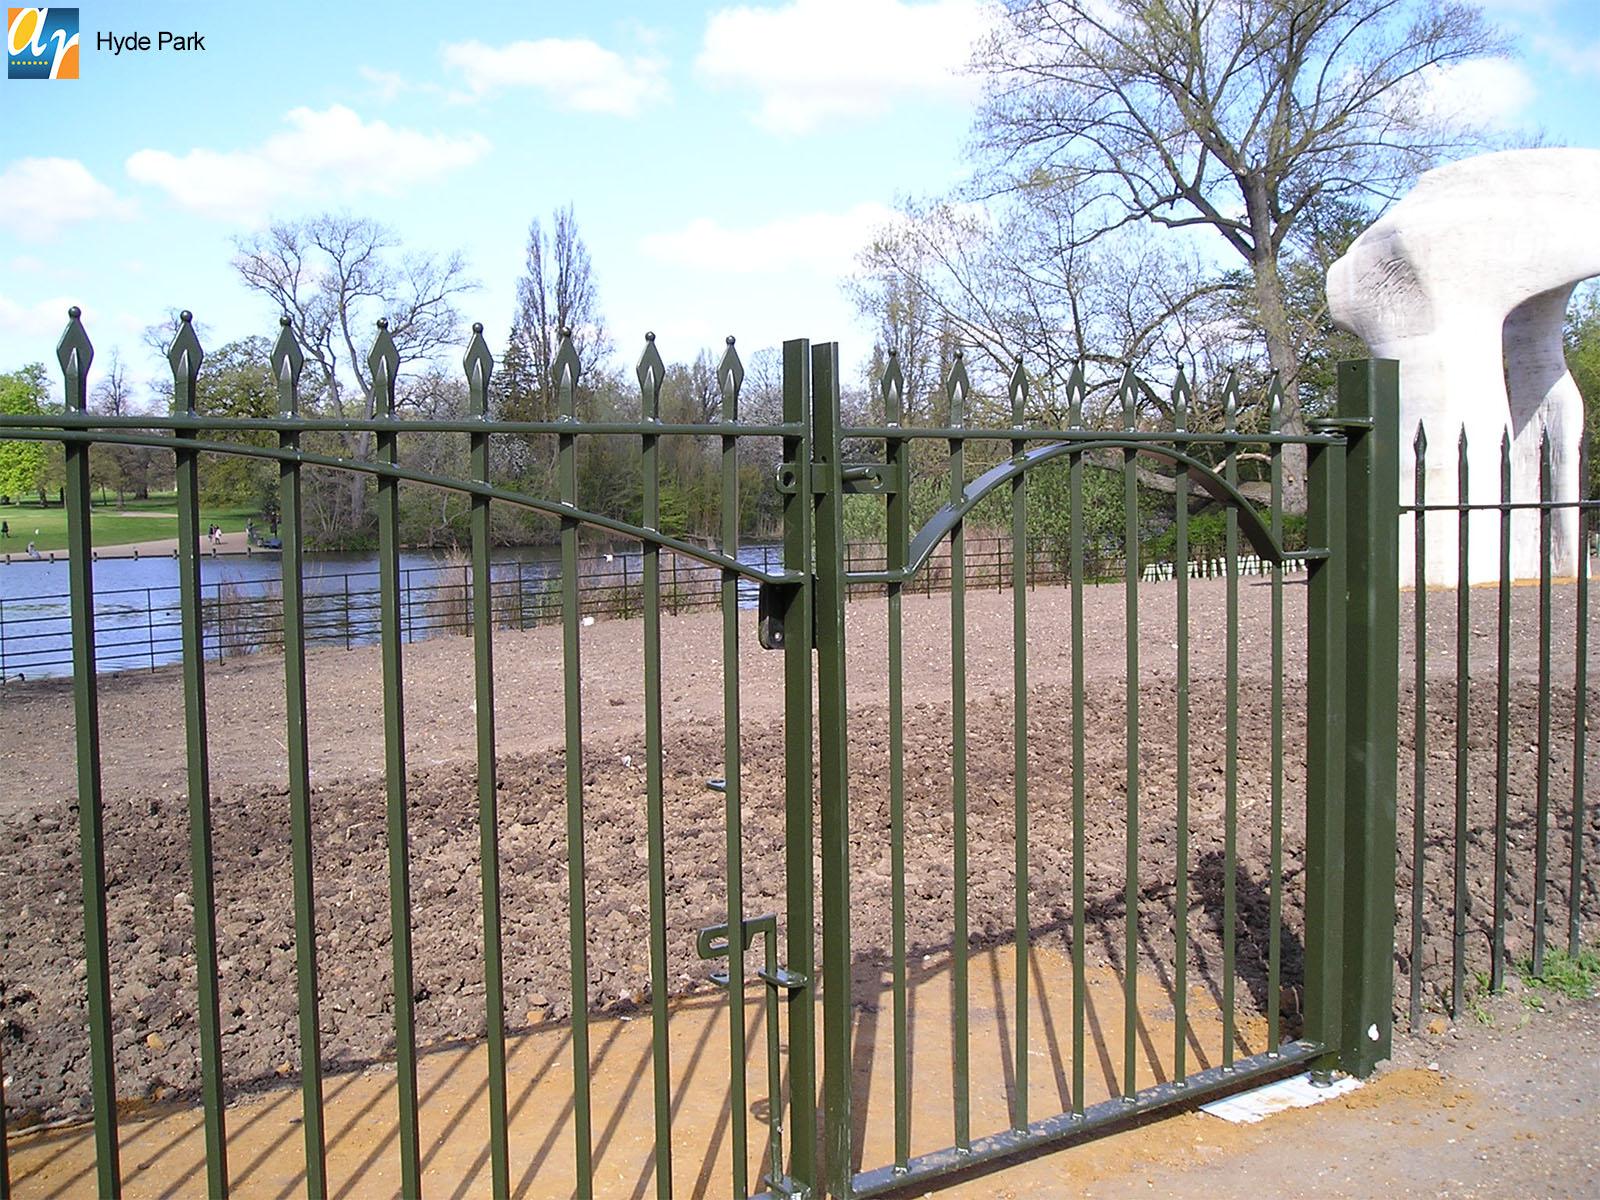 Hyde Park metal gate